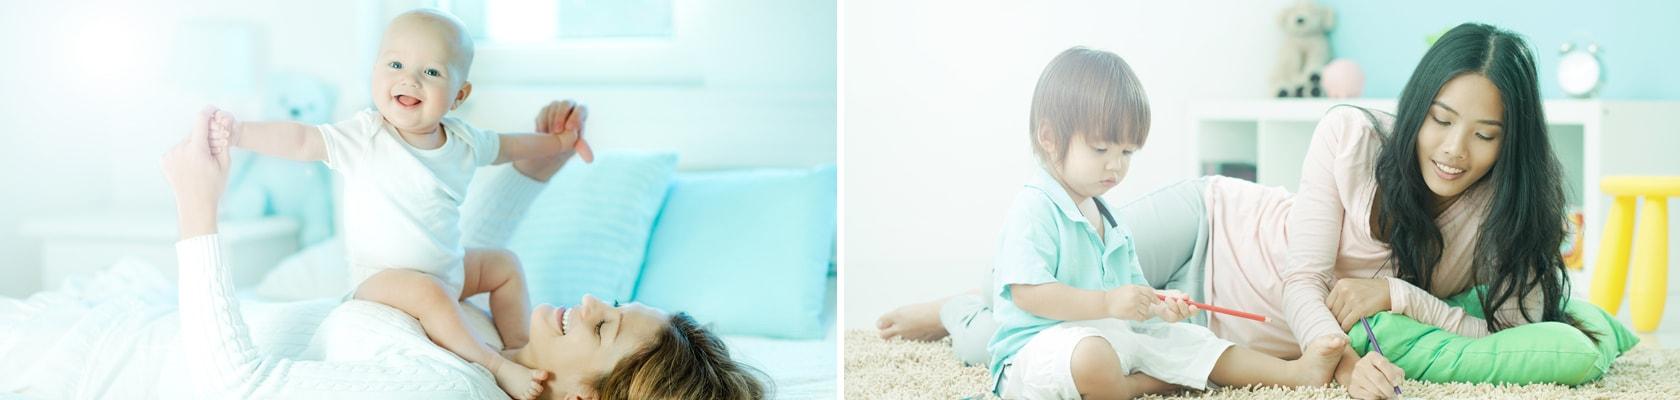 baby sitter dubai